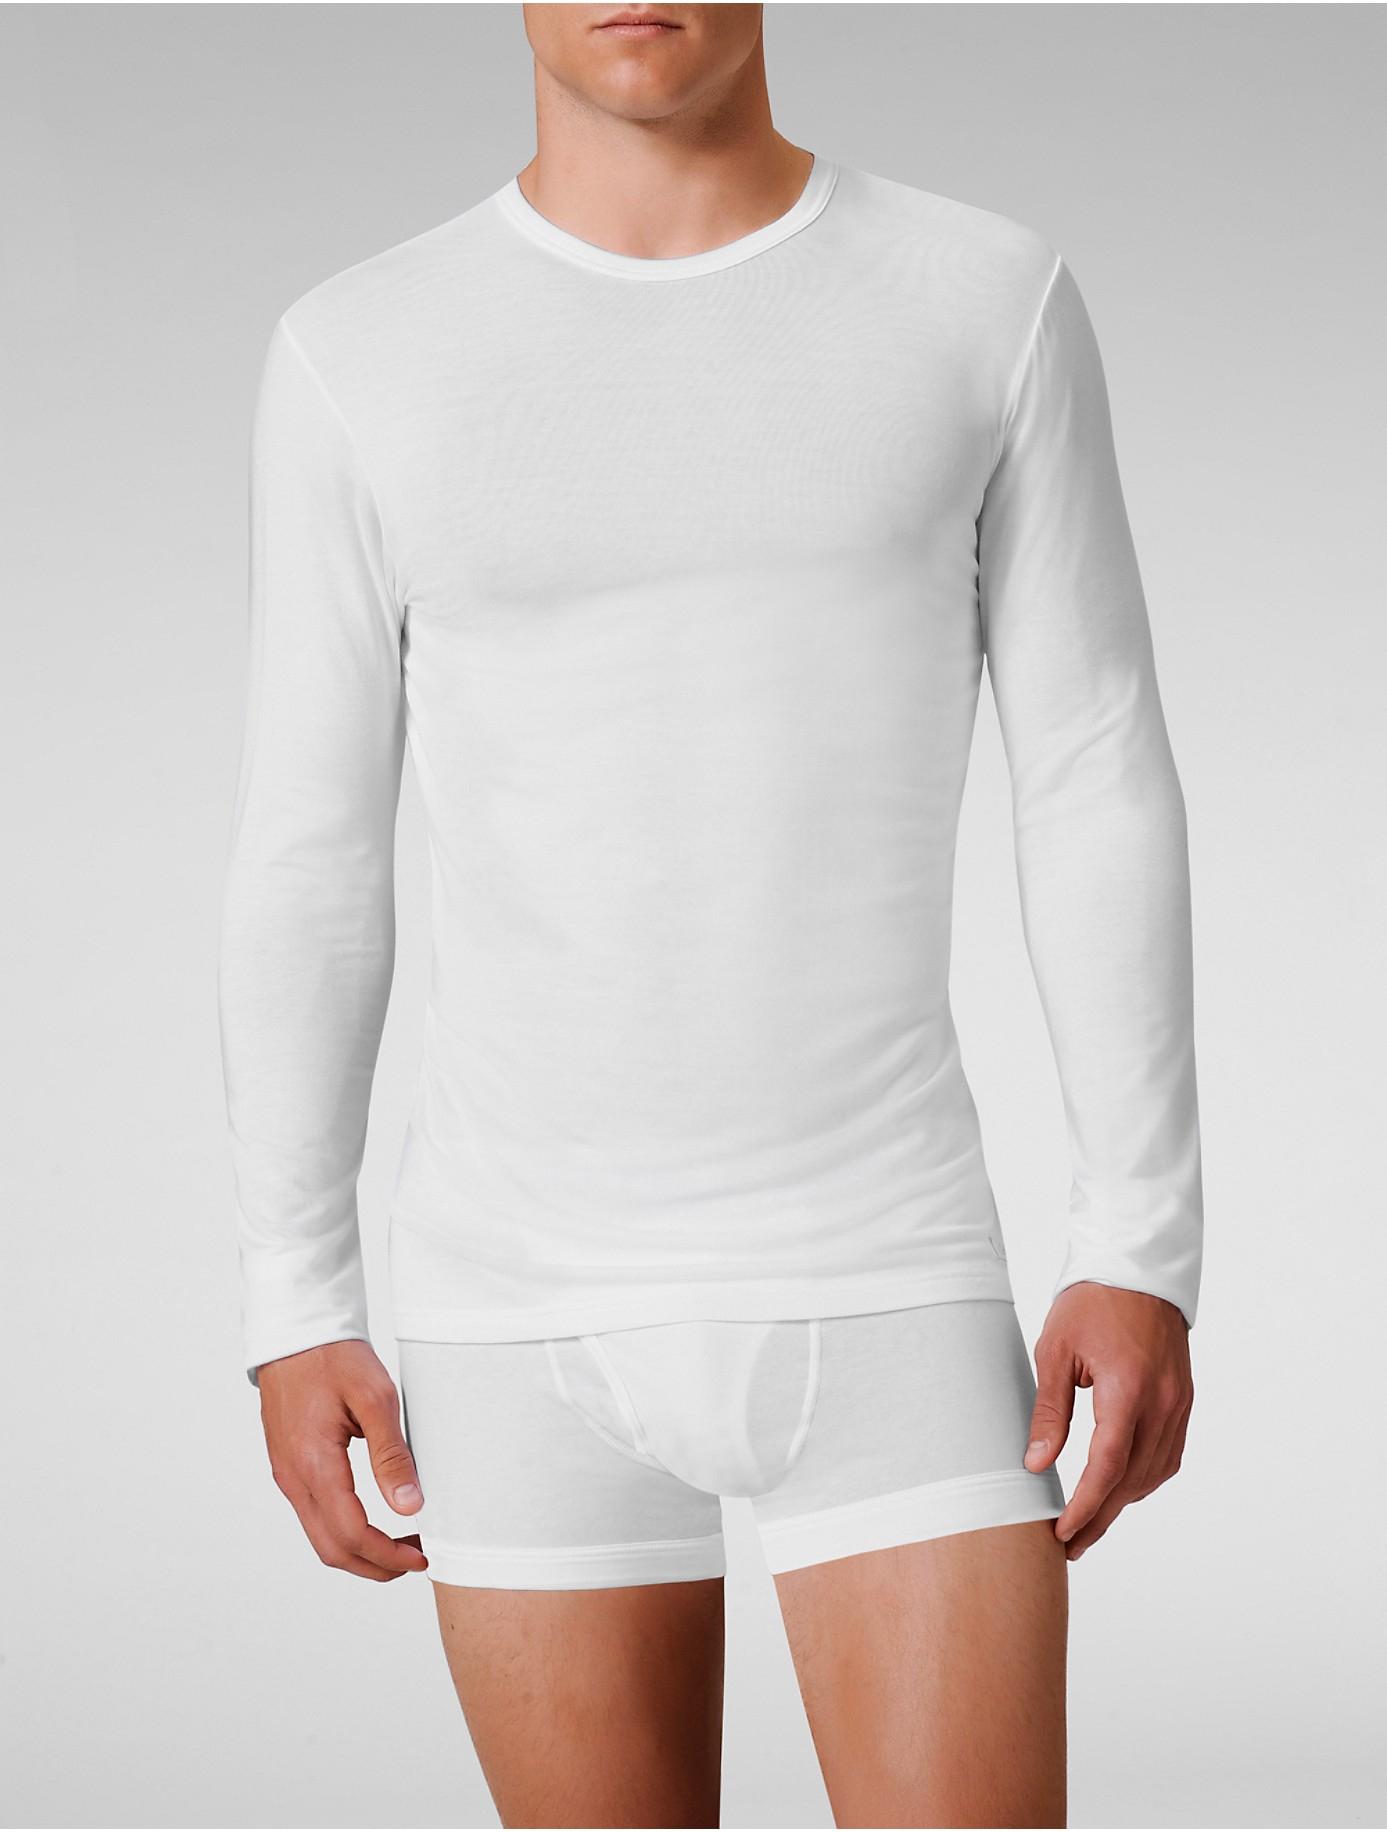 calvin klein underwear micro modal long sleeve crew in. Black Bedroom Furniture Sets. Home Design Ideas